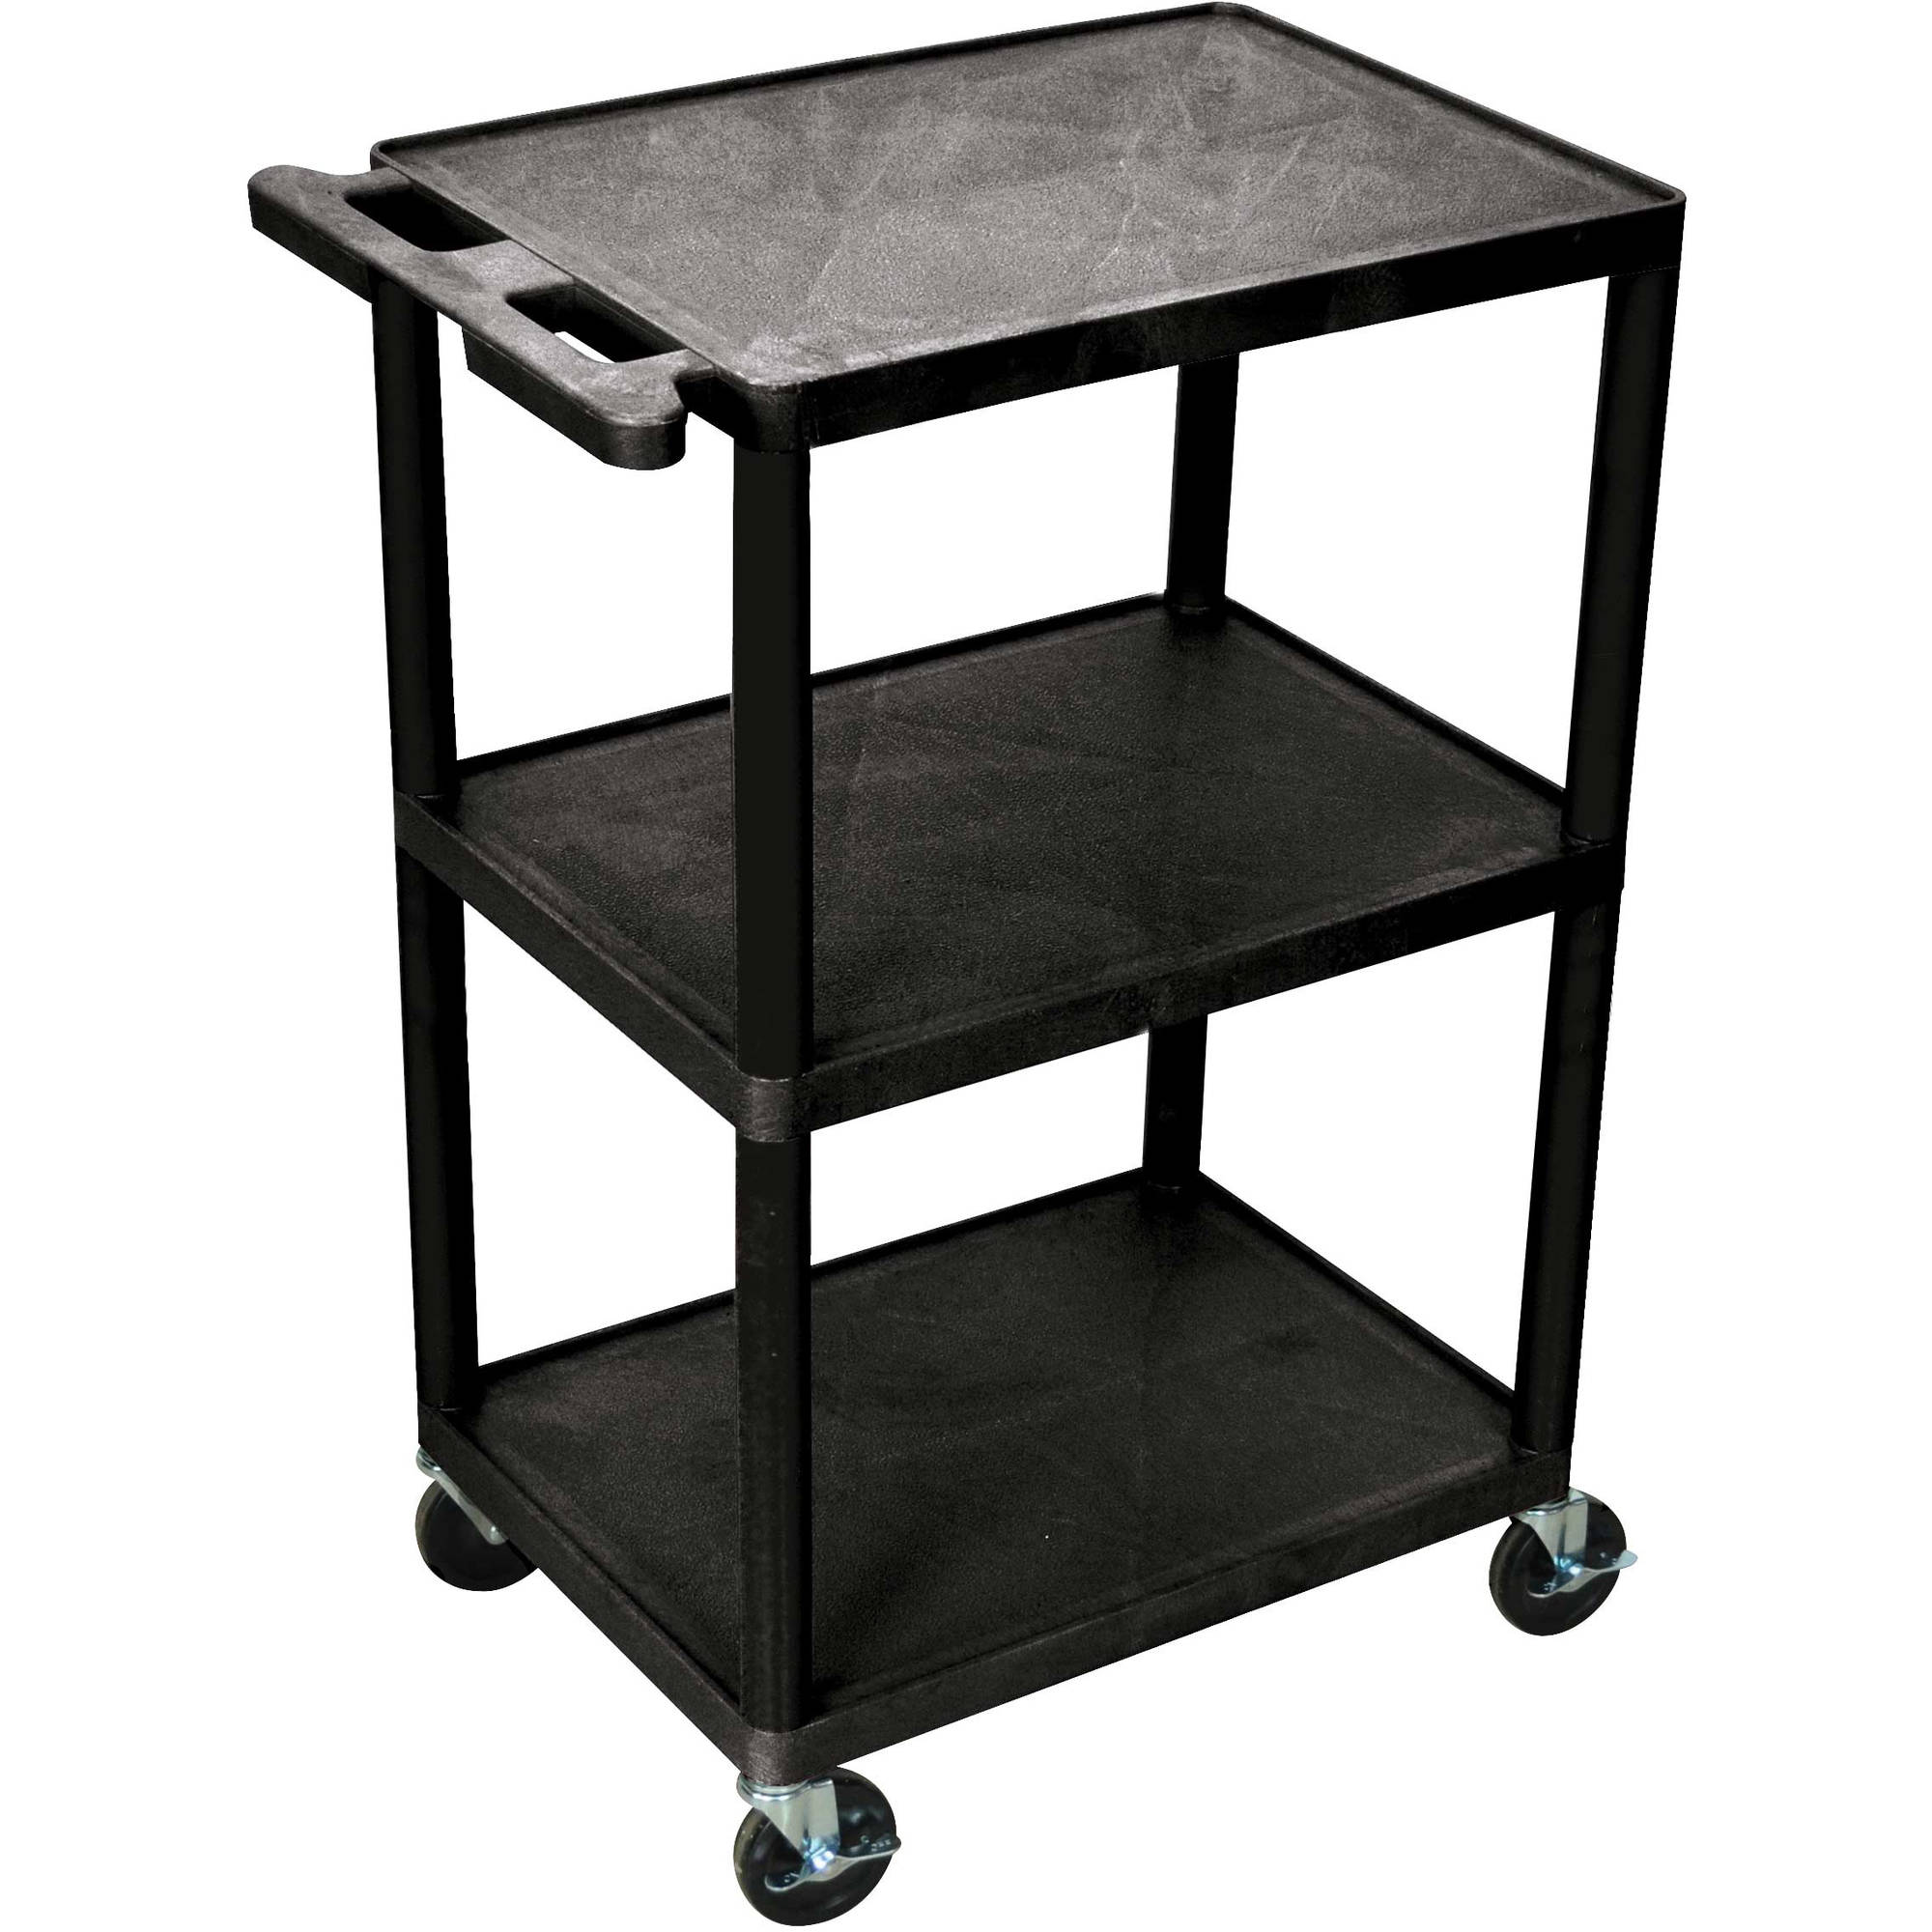 Luxor 3-Shelf Utility Cart, Black